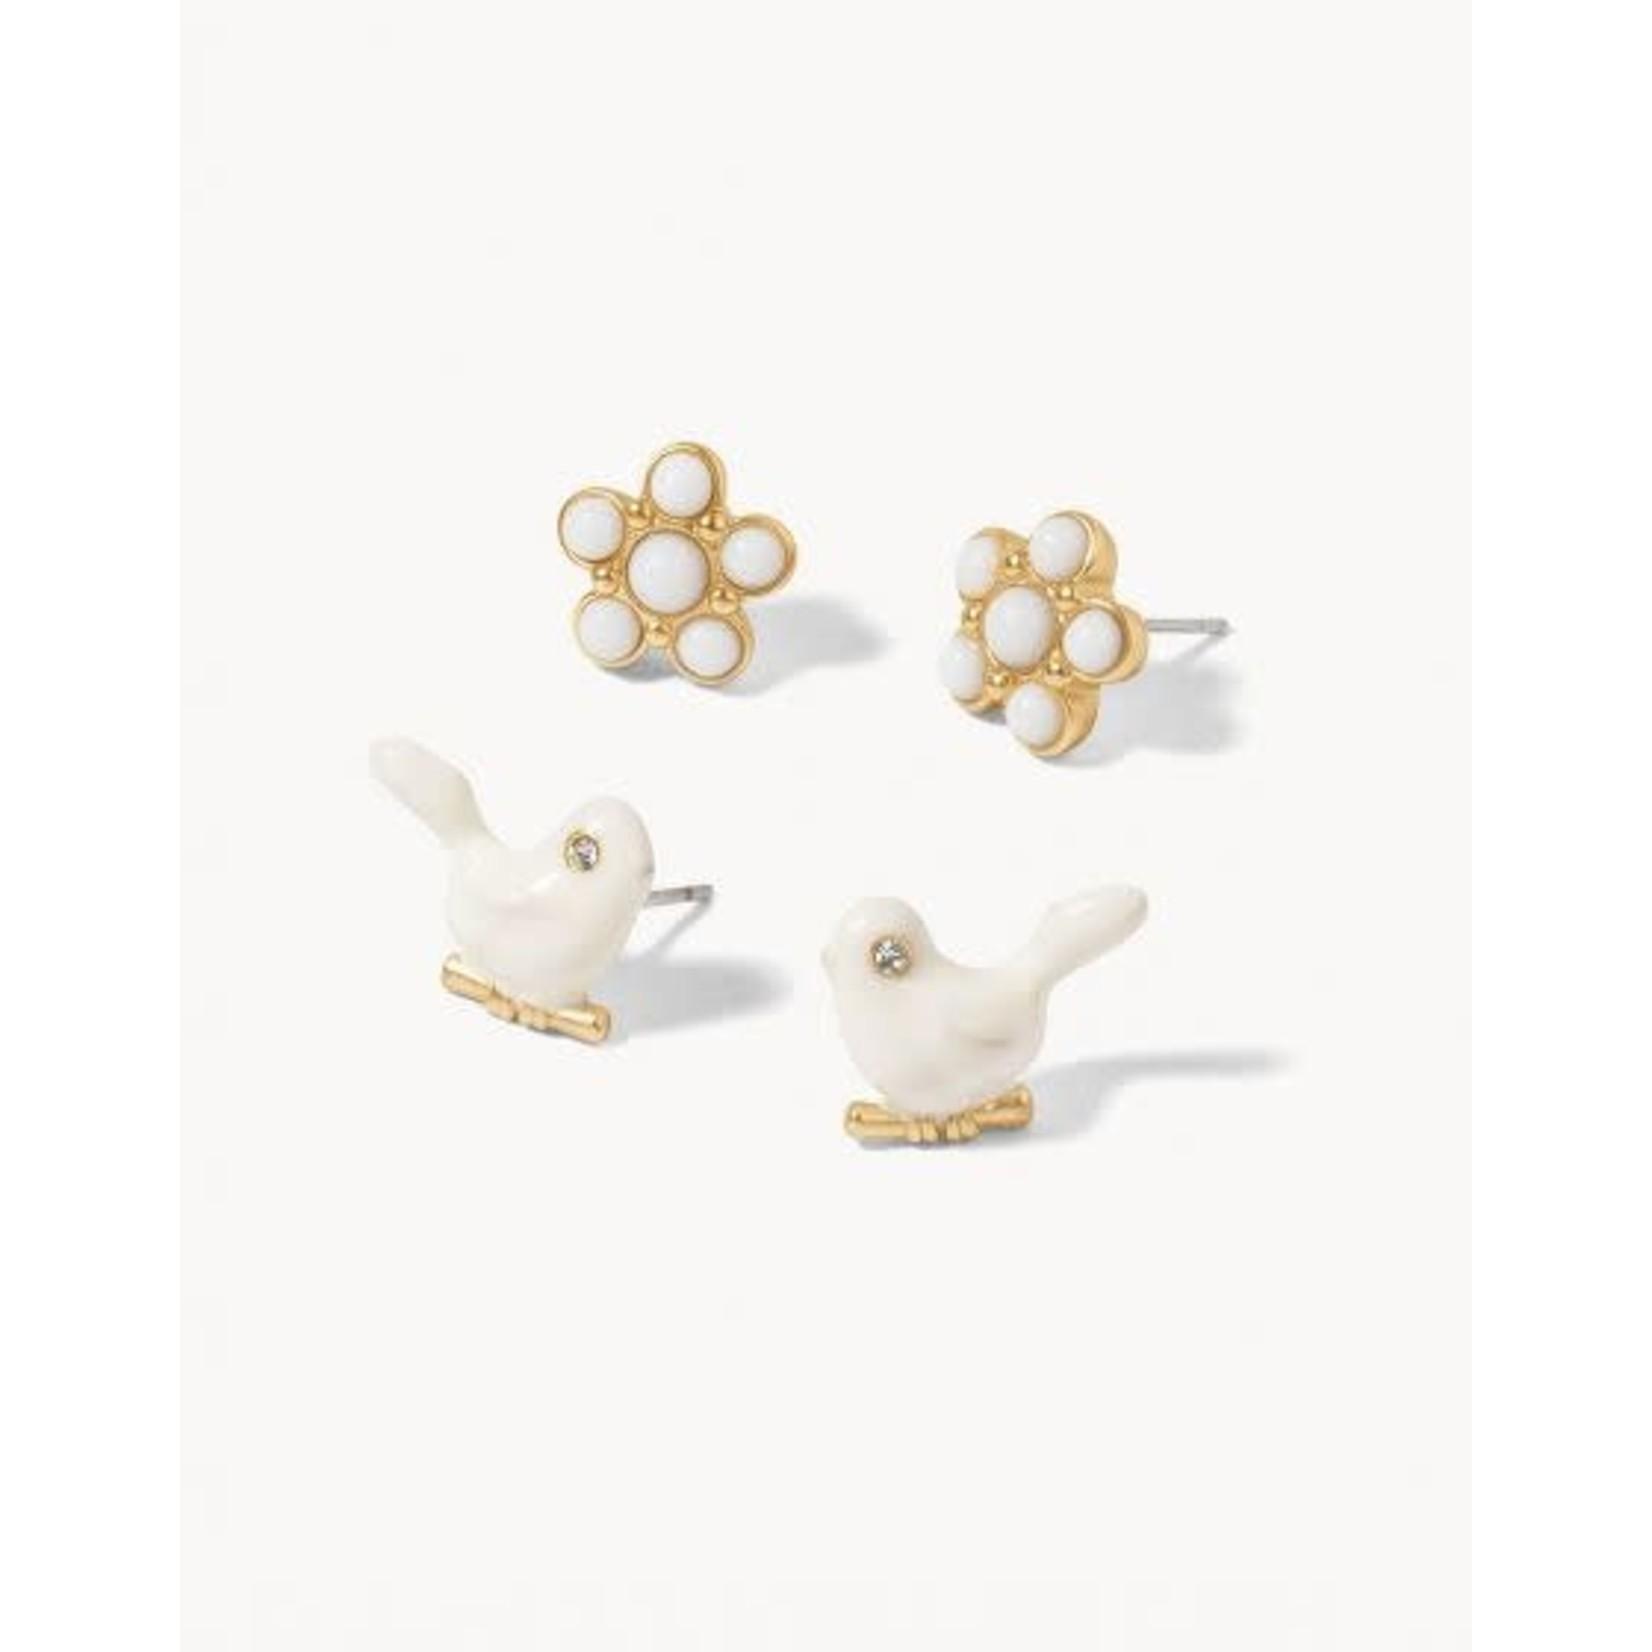 Spartina Songbird Stud Earring Set